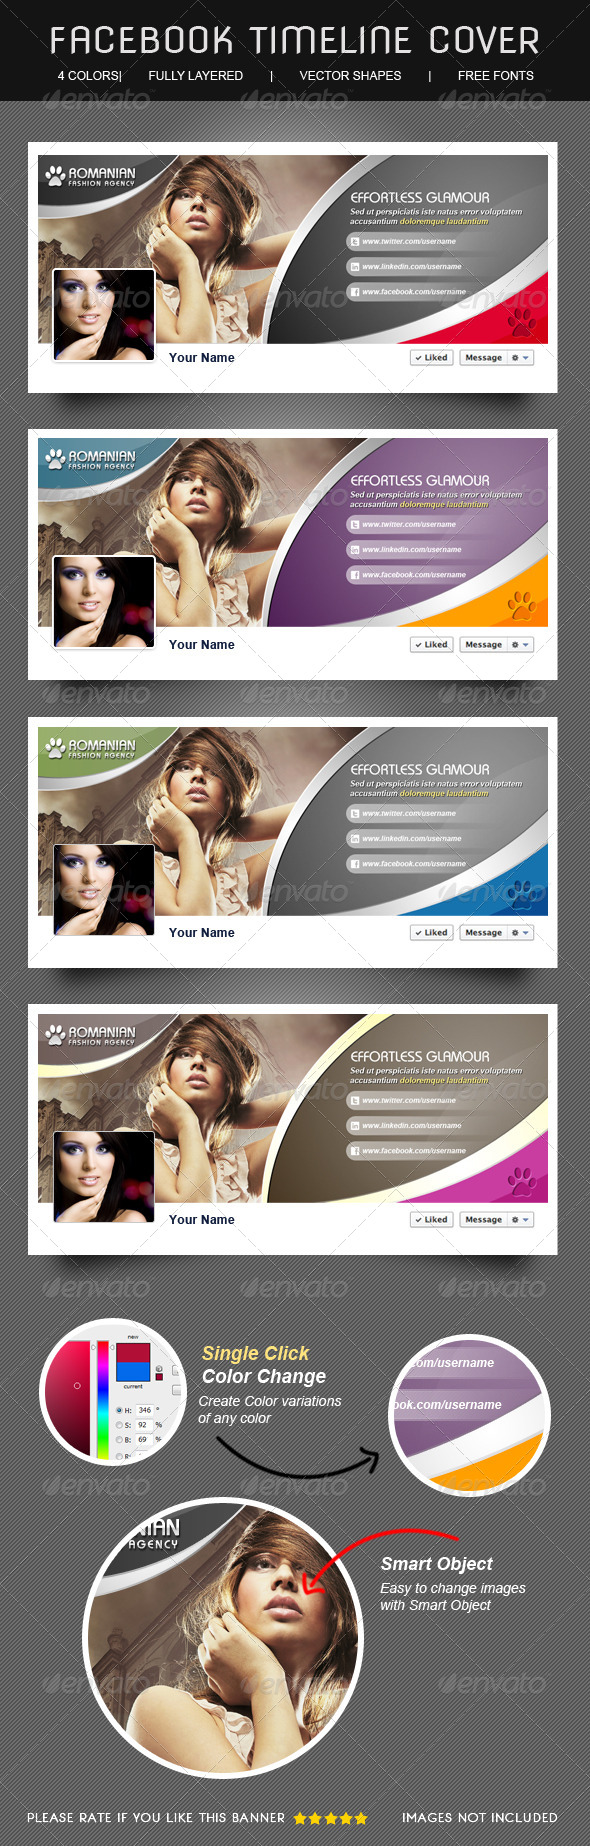 Glamour & Fashion Facebook Timeline Cover  - Facebook Timeline Covers Social Media